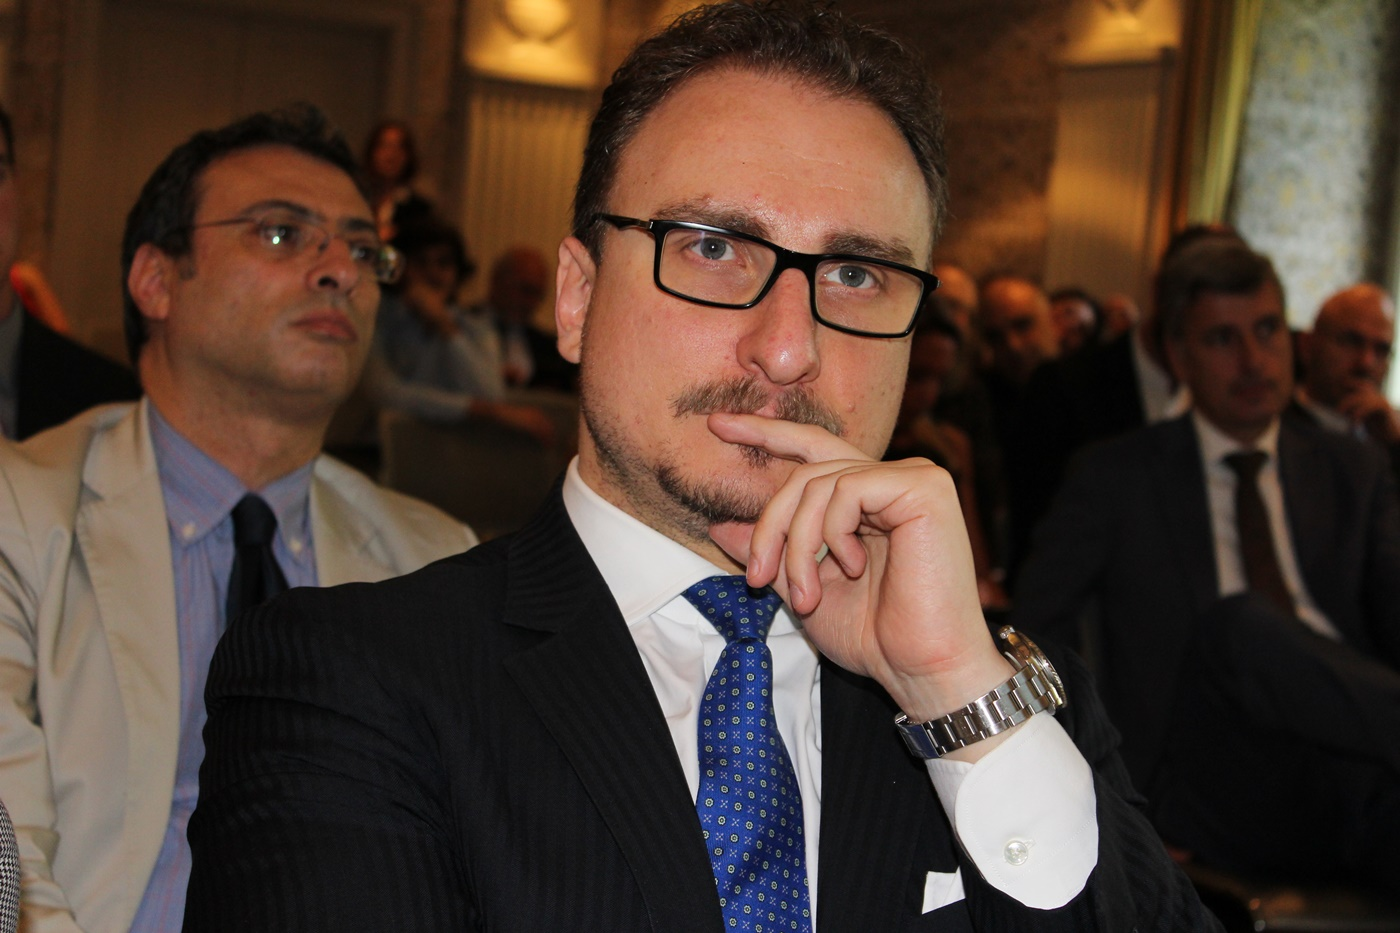 Stefano Mele, stati uniti